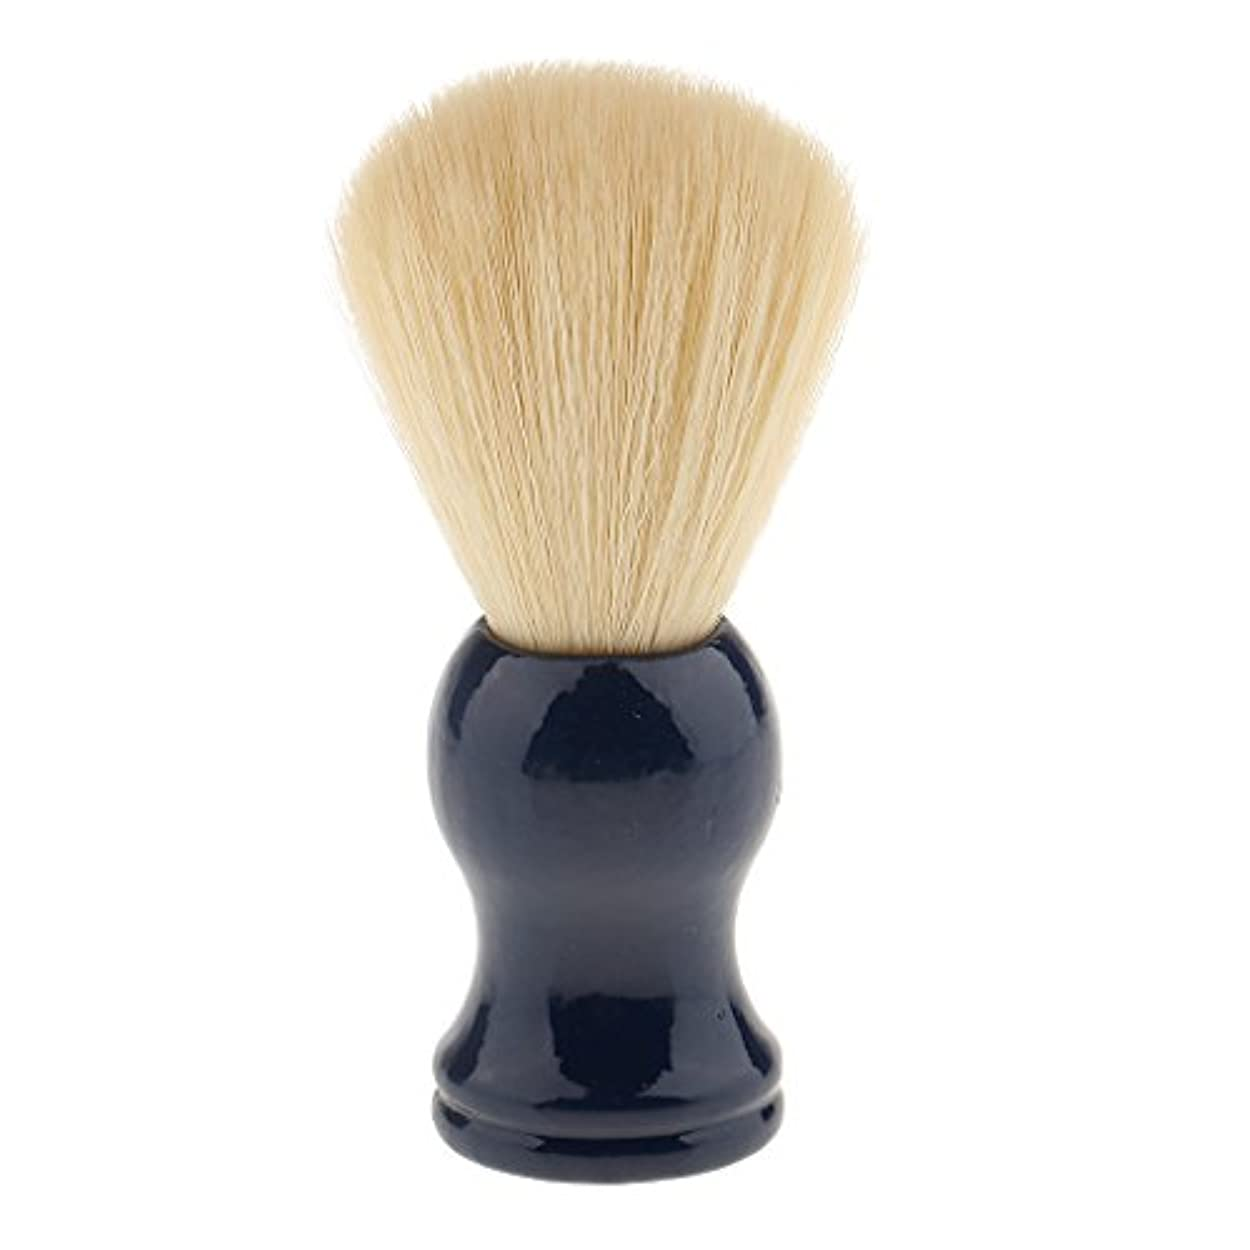 Baoblaze ナイロン ひげブラシ シェービング ブラシ 髭 泡立て 散髪整理  理髪用 サロン 快適 美容院